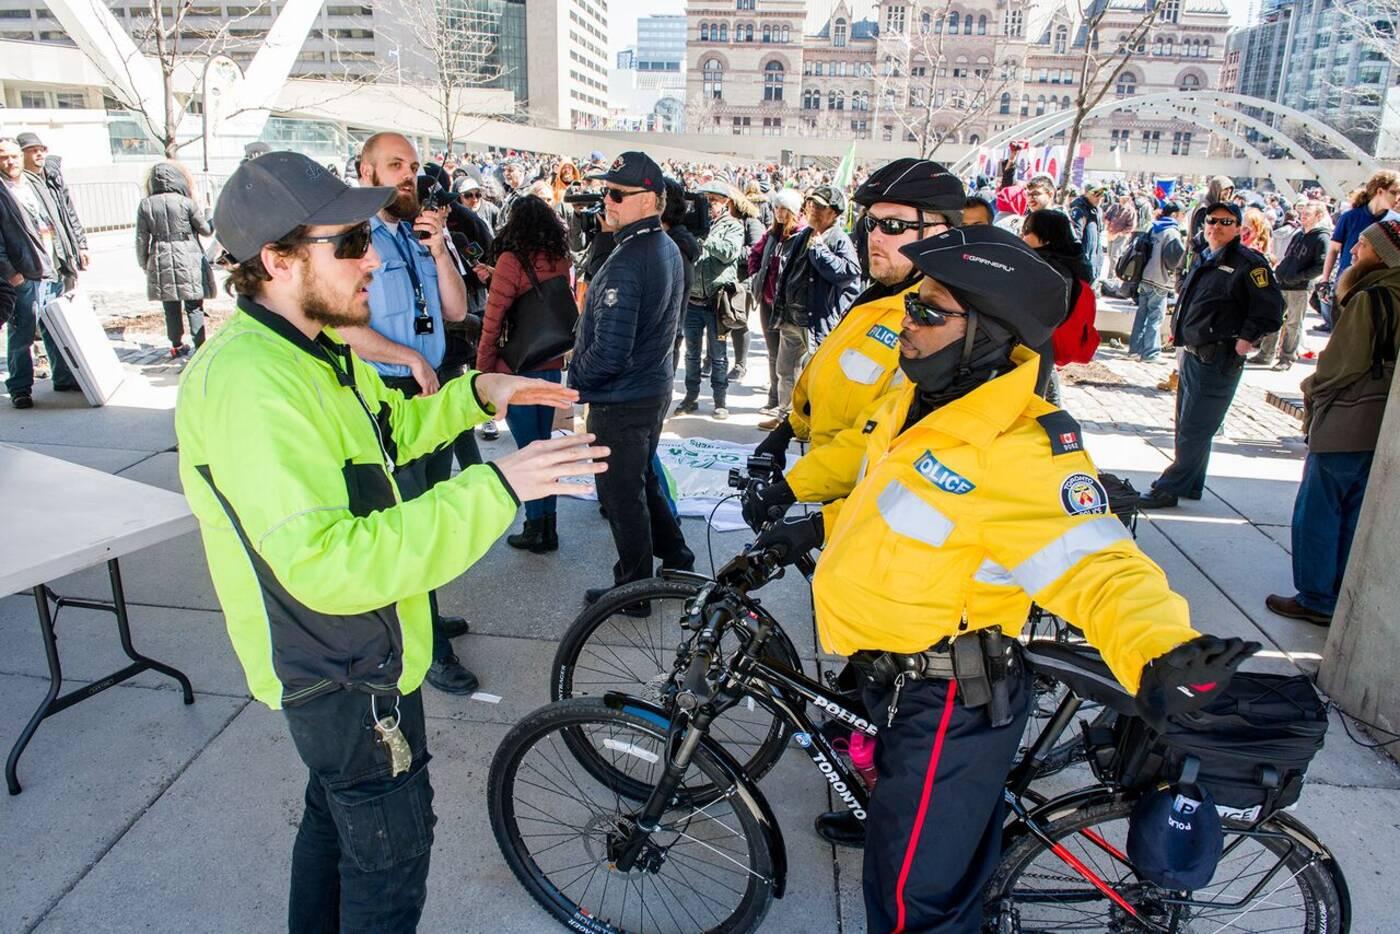 Toronto police put a damper on 420 festival outside City Hall